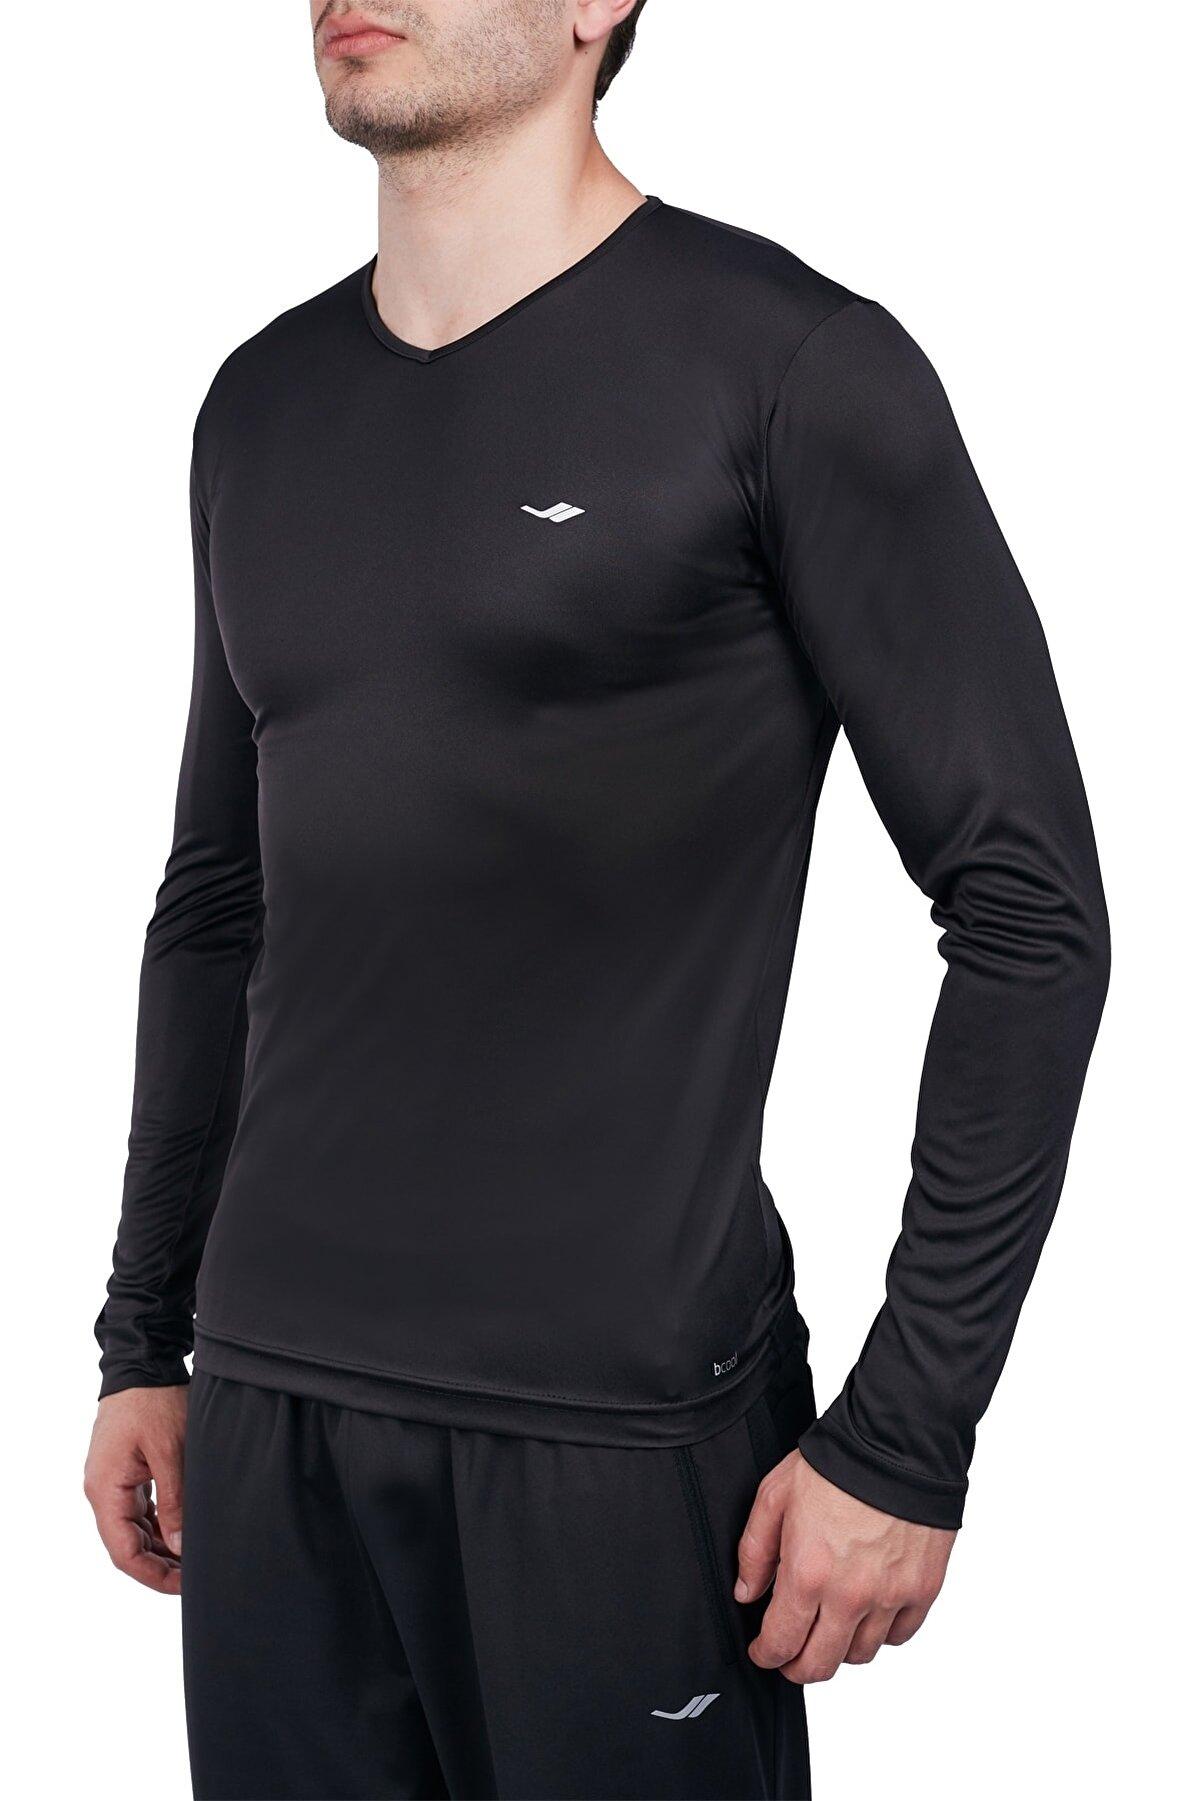 Lescon Siyah Erkek Uzun Kol T-shirt 20s-1223